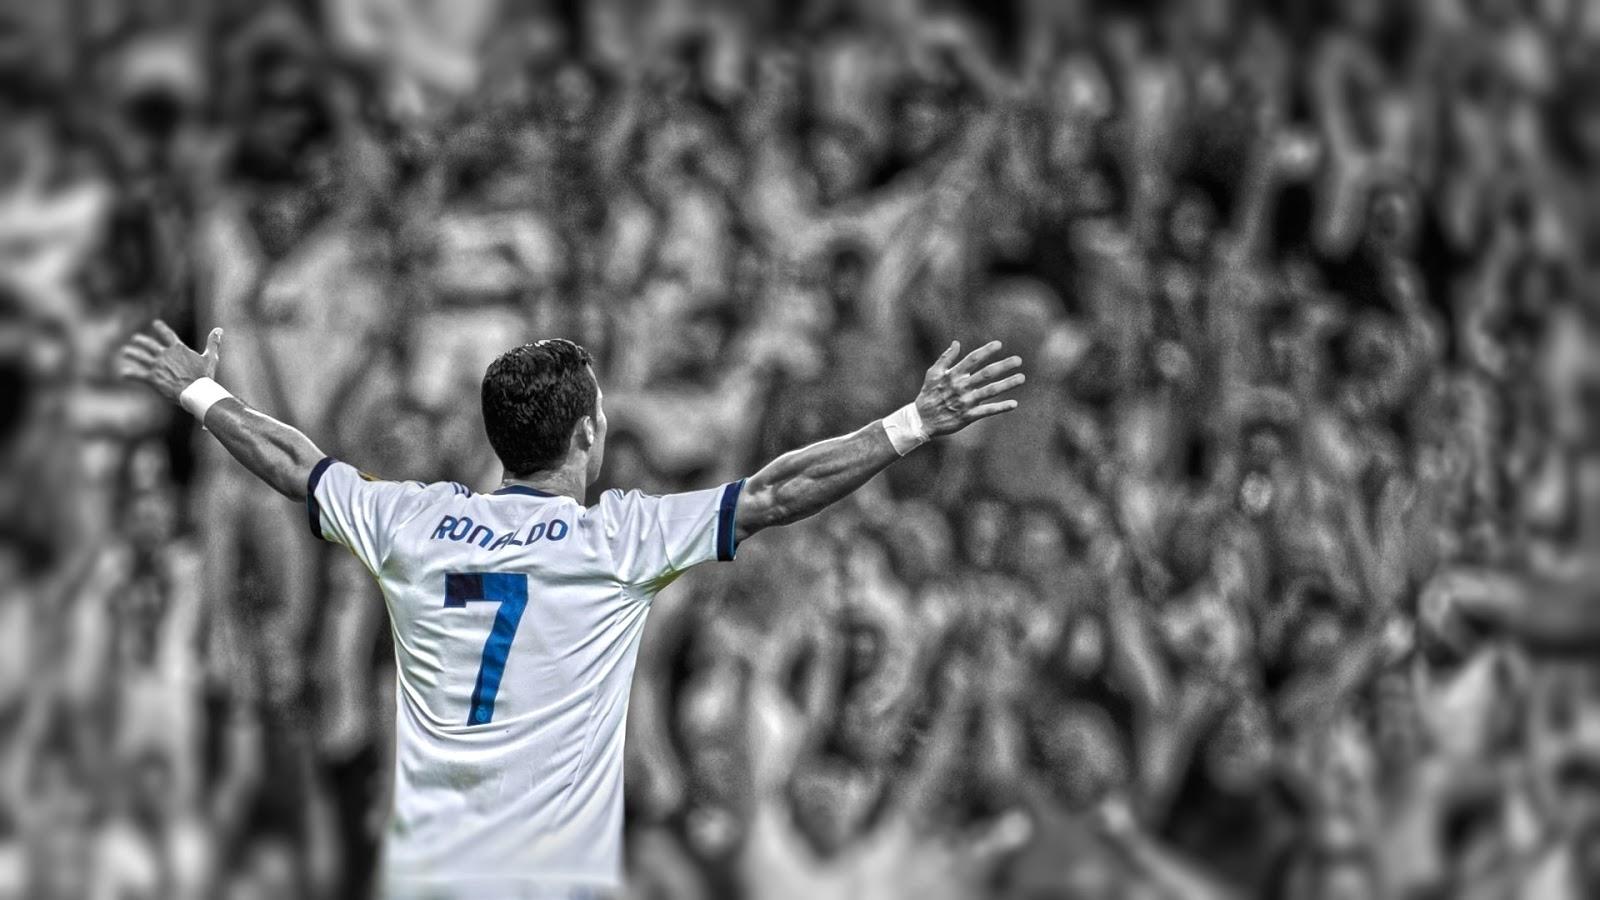 Christiano Ronaldo - Highly Paid Footballer